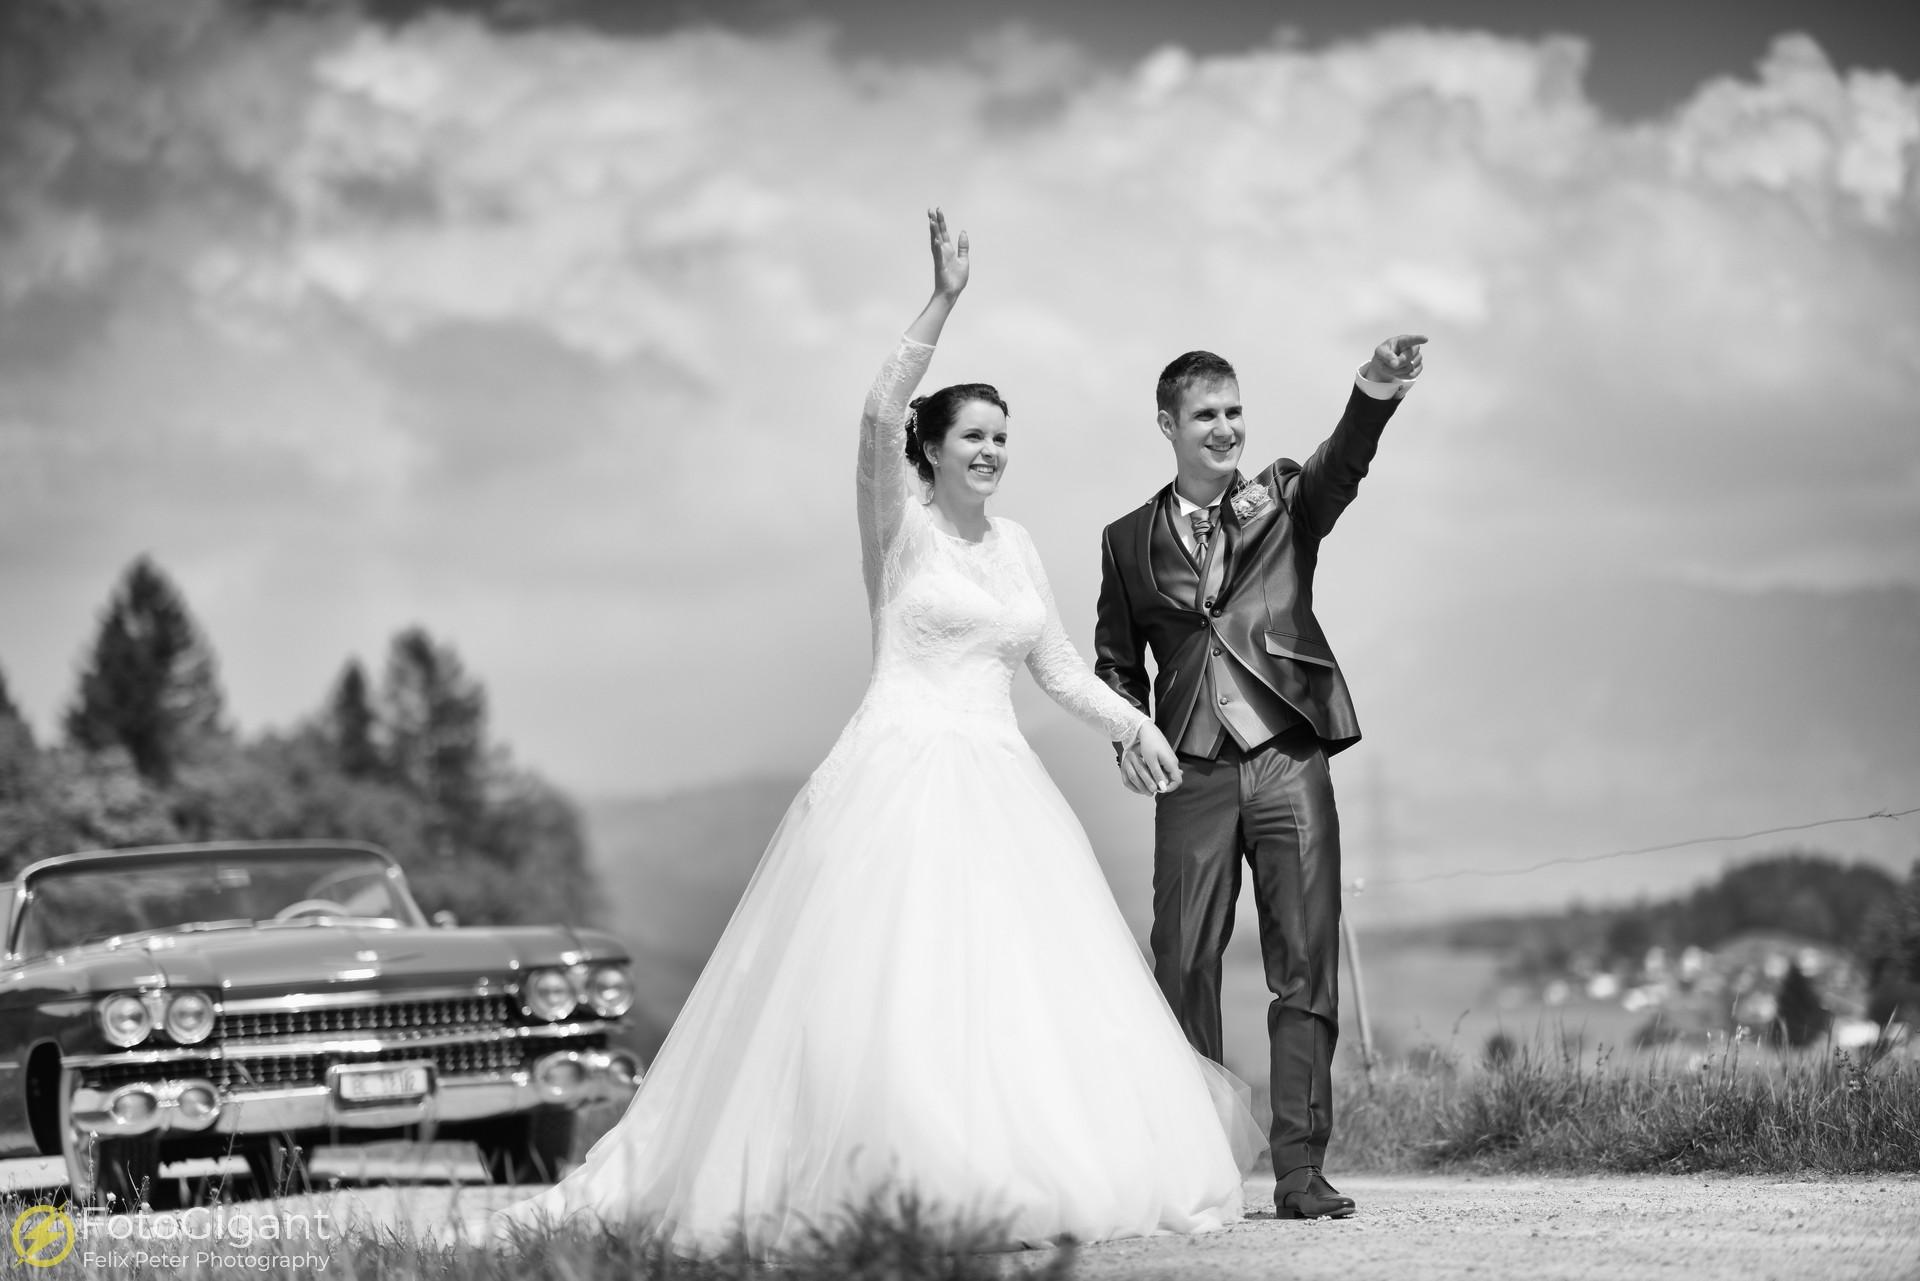 Hochzeitsfotograf_Bern_8.jpg